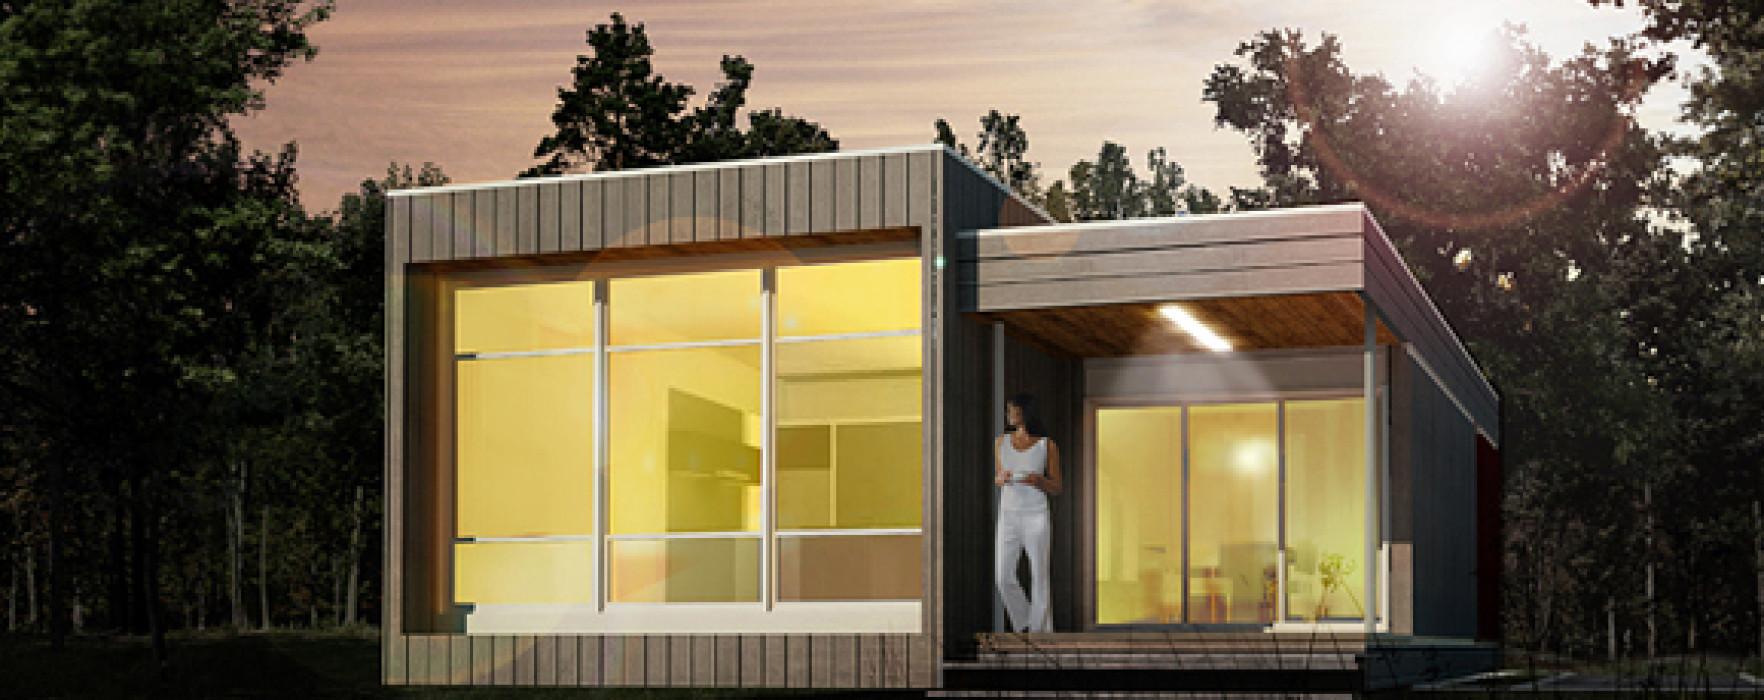 Case in legno prefabbricate a prezzi bassi - Casa in legno prezzi ...